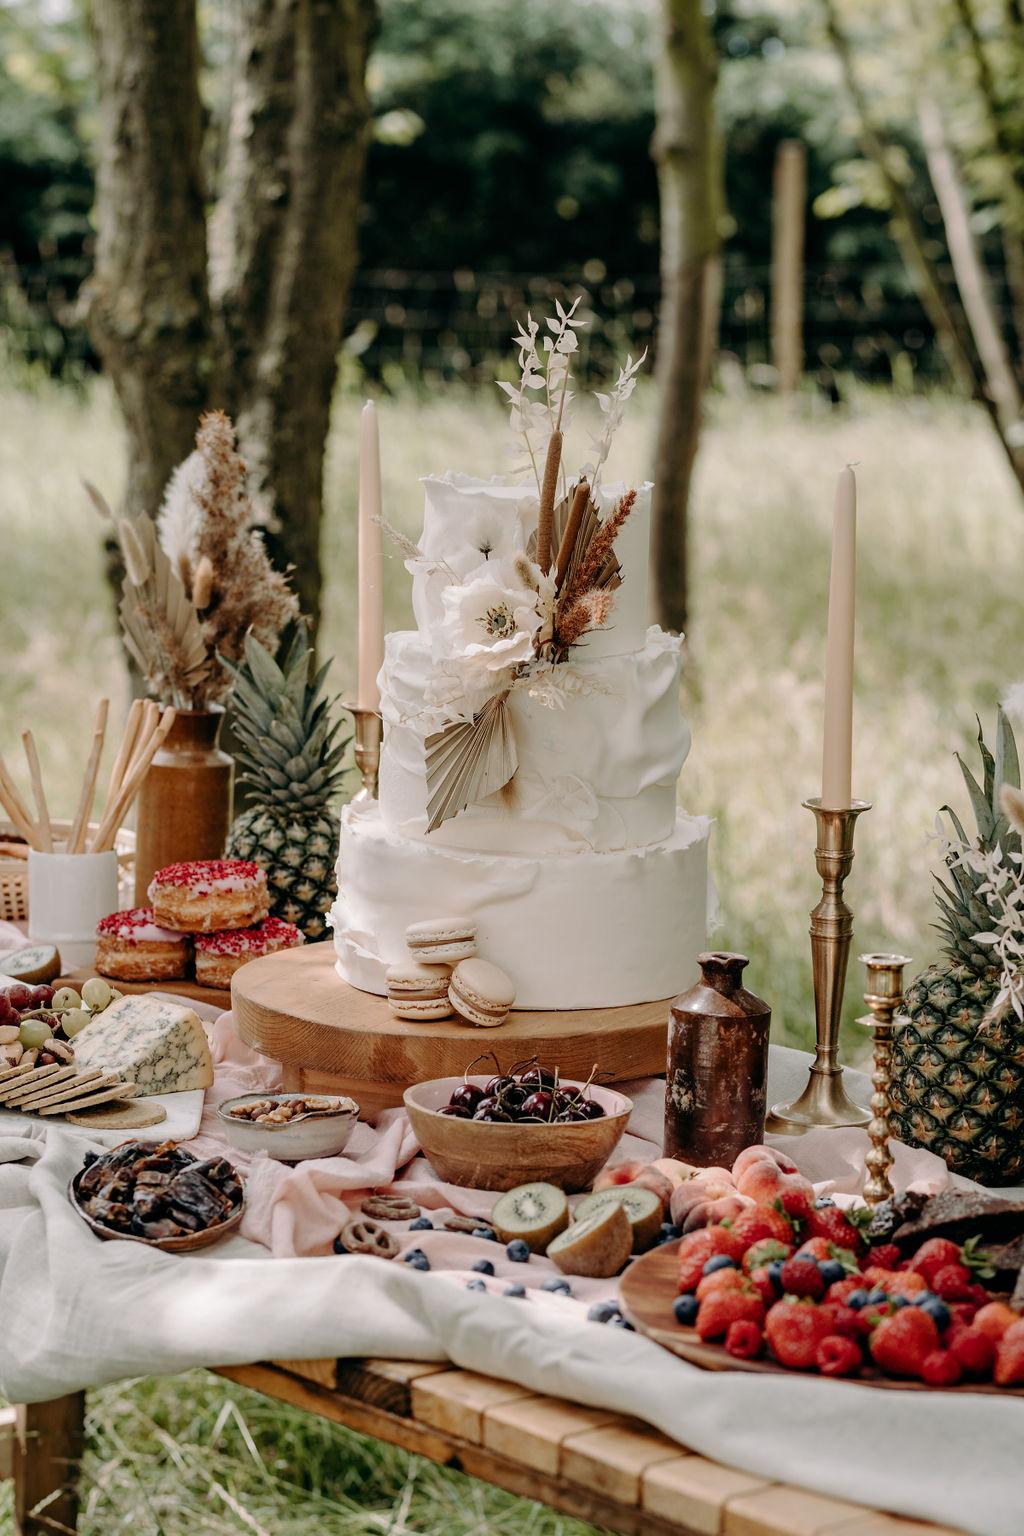 simple wedding cake - boho wedding cake - wedding grazing table - micro wedding - unconventional wedding